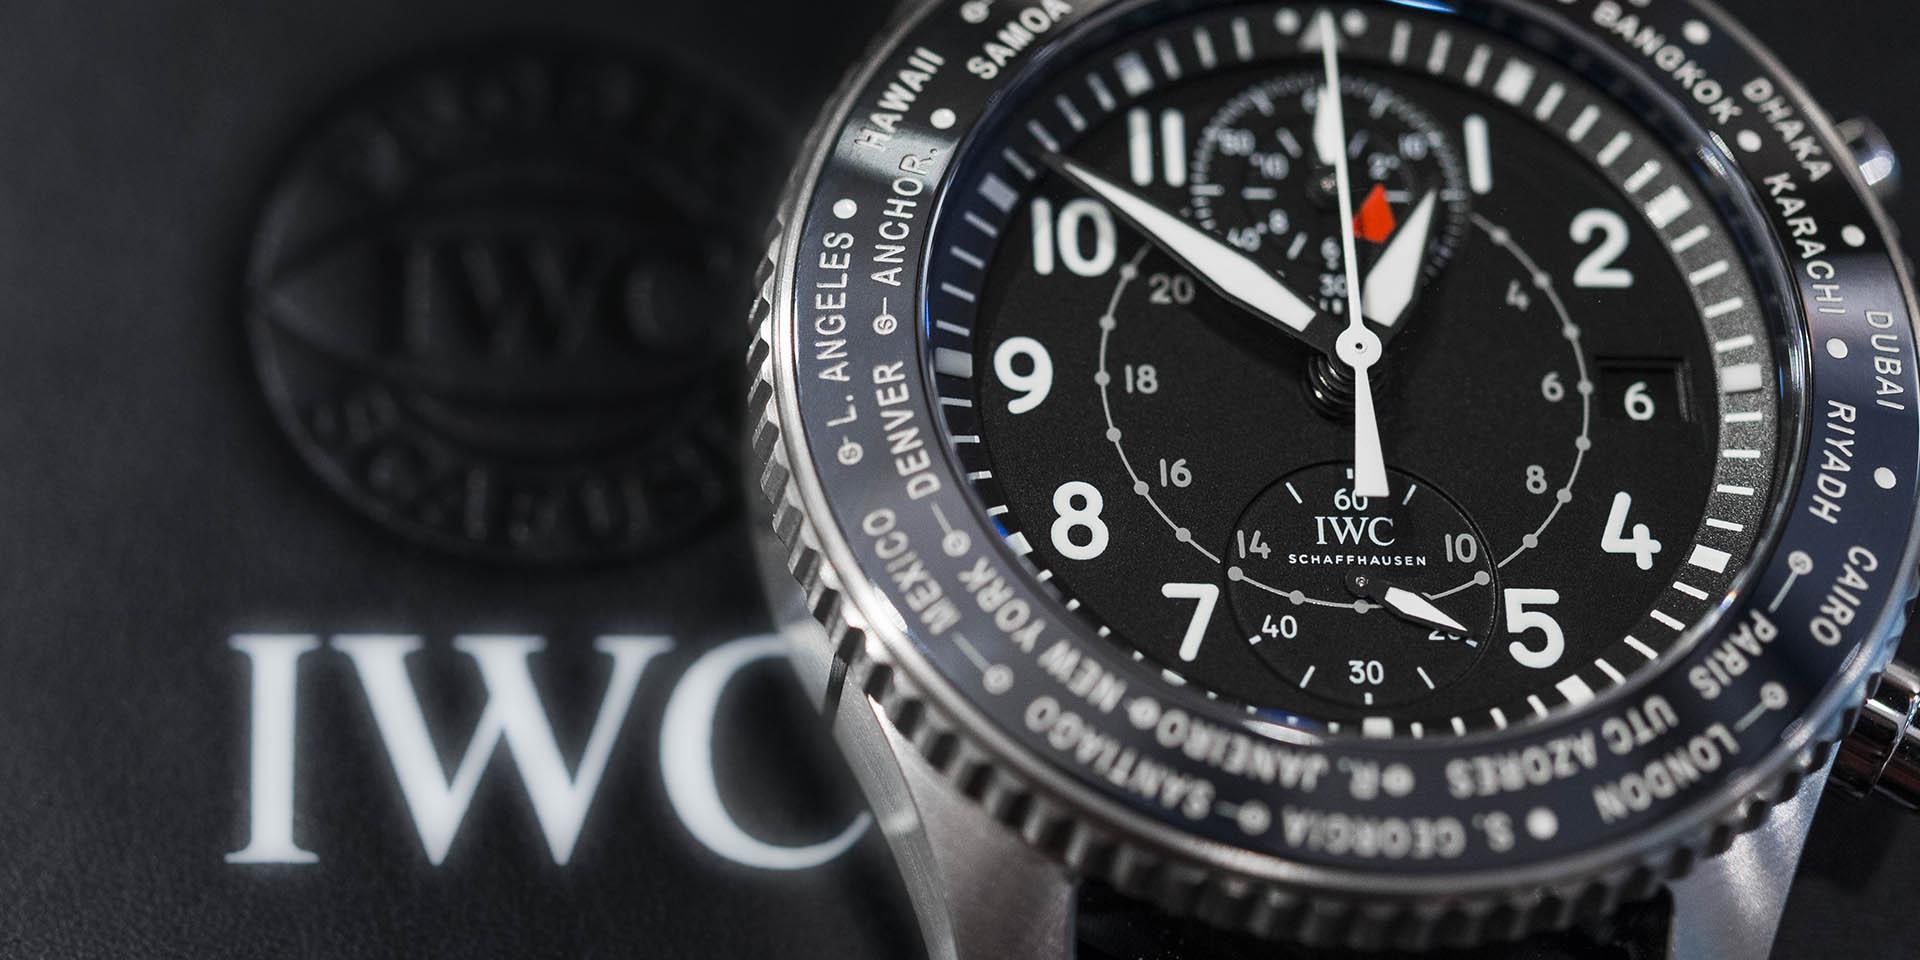 iwc-timezoner-chronograph-iw395001.jpg